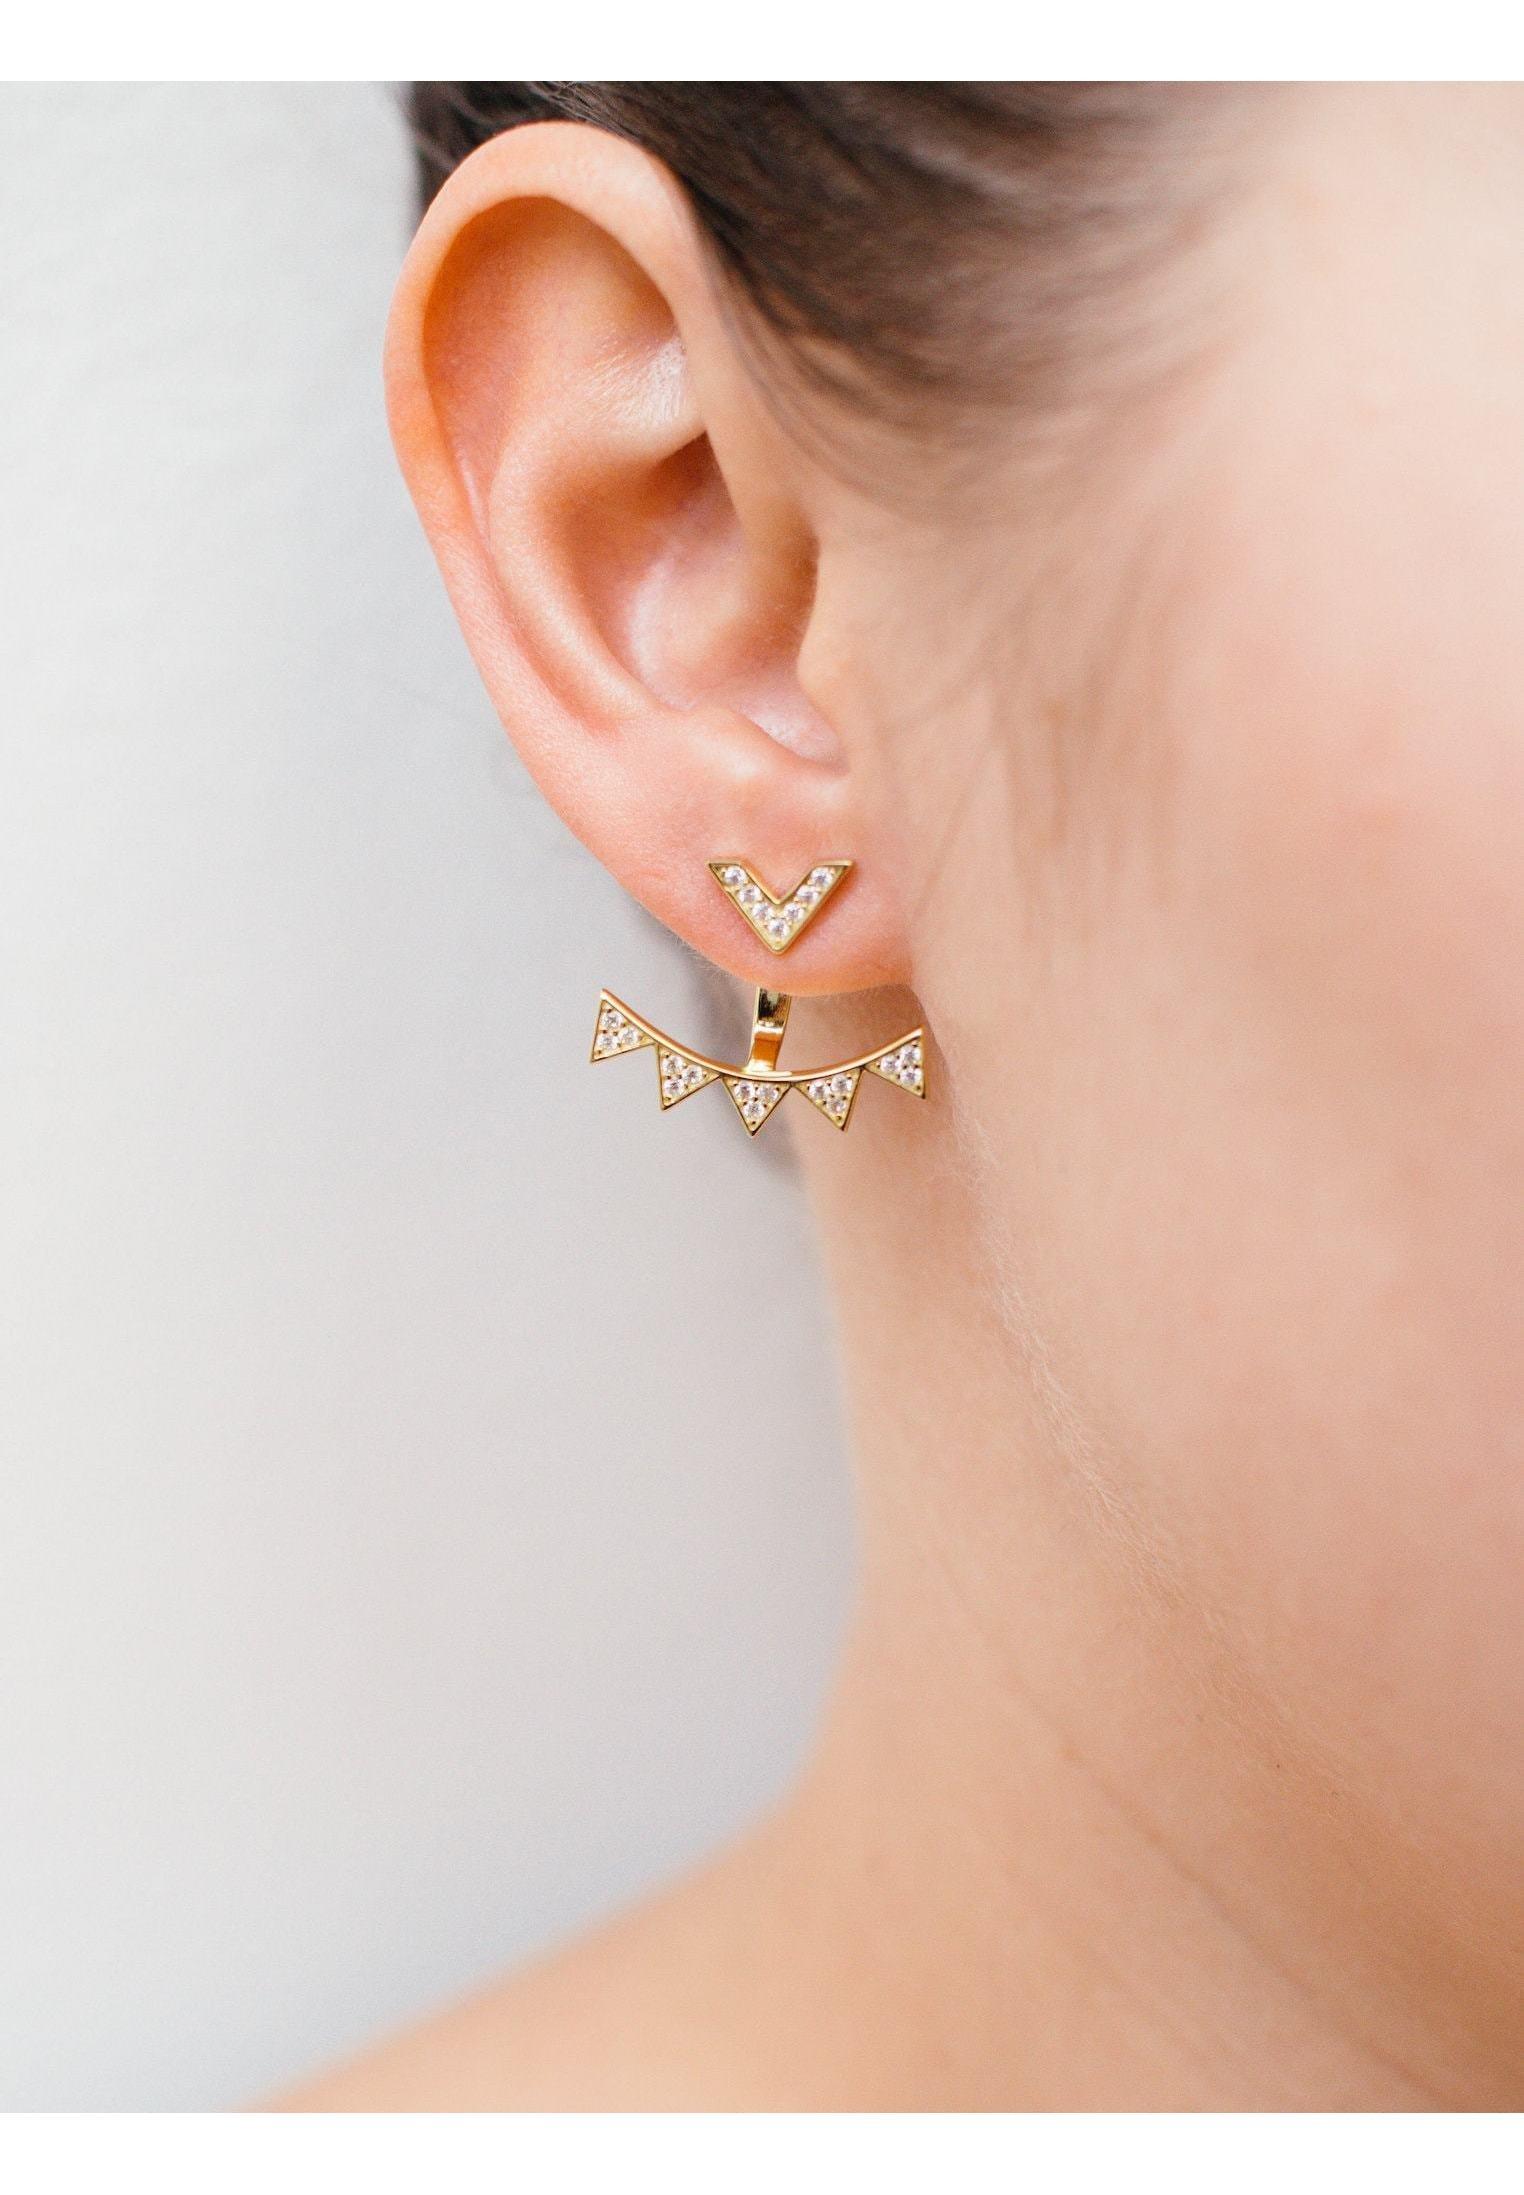 Arion Jewelry Ohrringe - Roségold/roségoldfarben